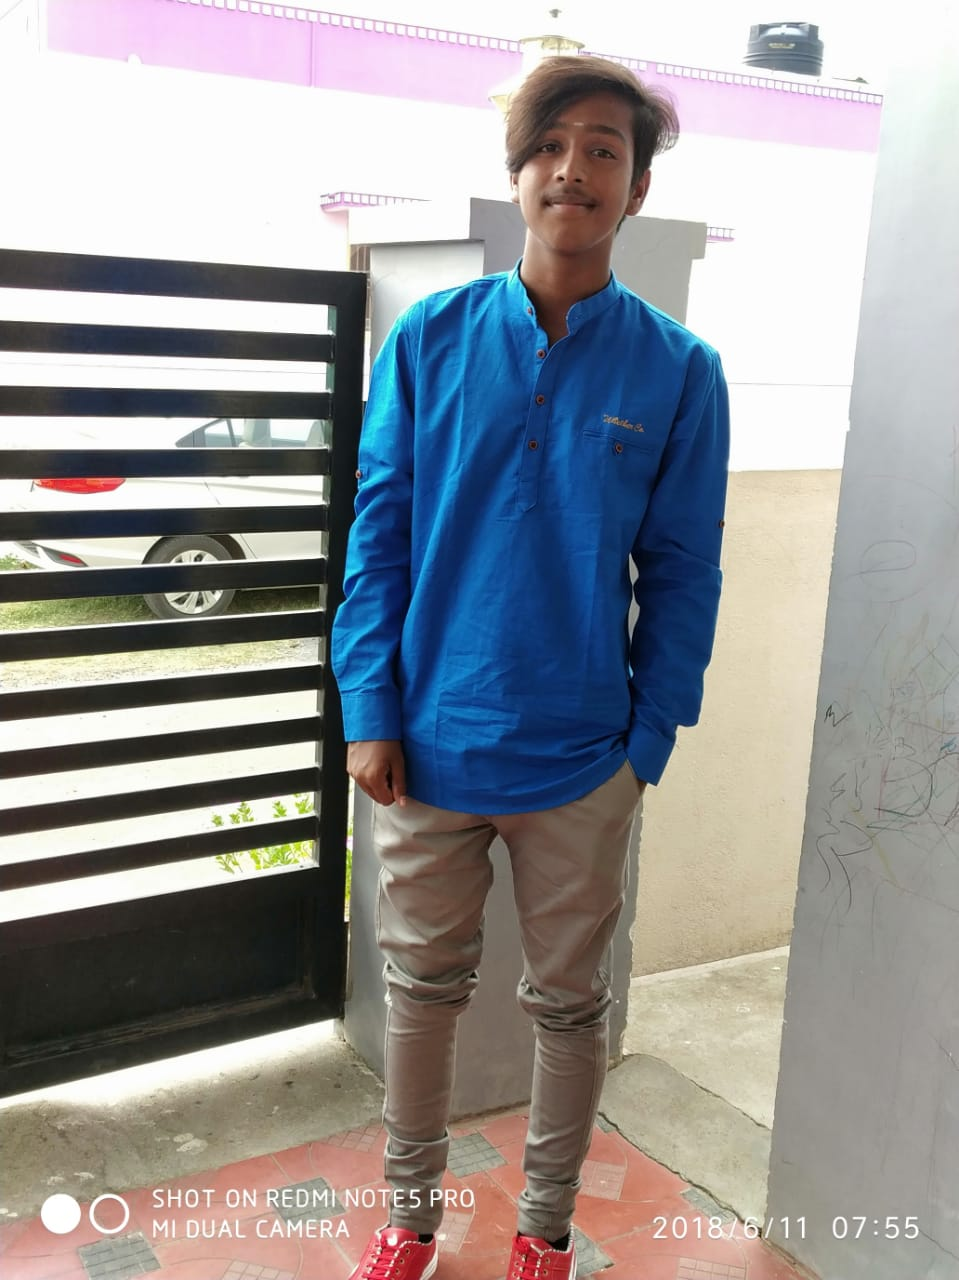 RISHI KOHLI  – The youngest and leading digital entrepreneur from Tamilnadu,India